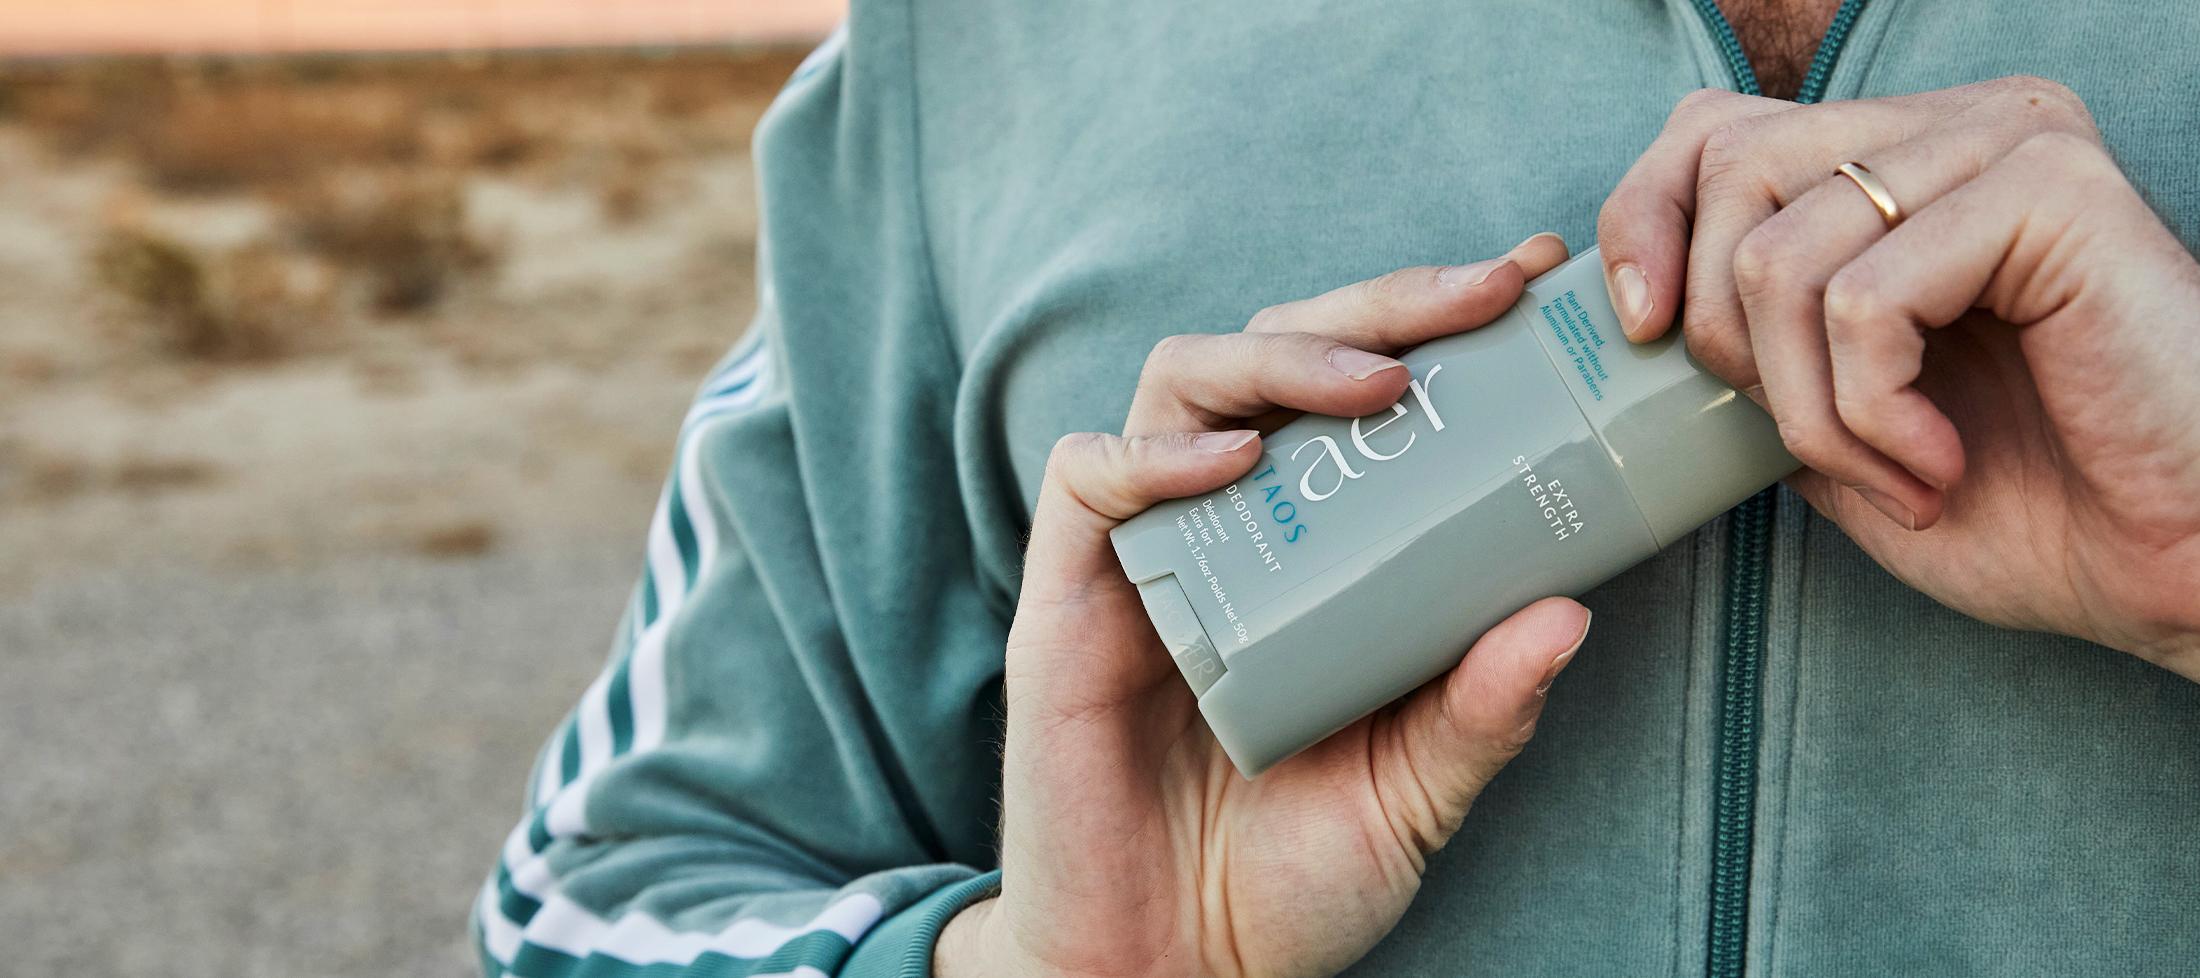 Extra Strength Deodorant